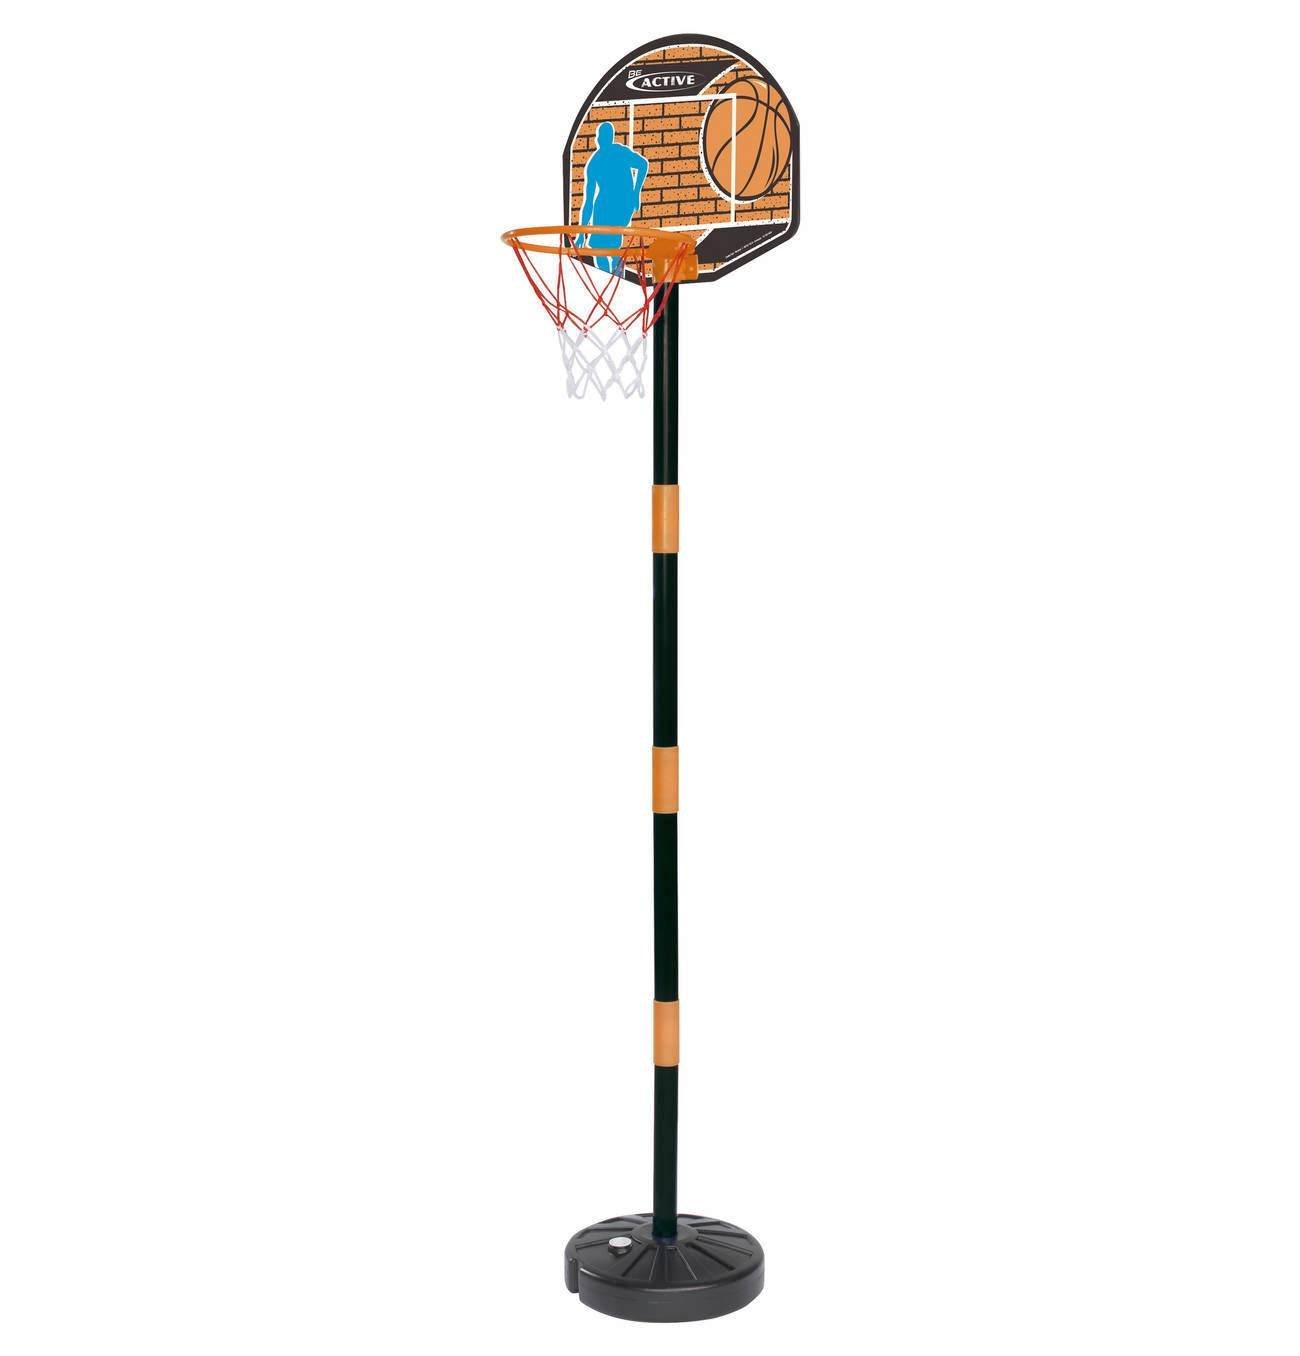 With Mini Basketball Board Basket Net Standing Poles Air Pump Simba Mini Basketball Set Height 40 to 160 cm